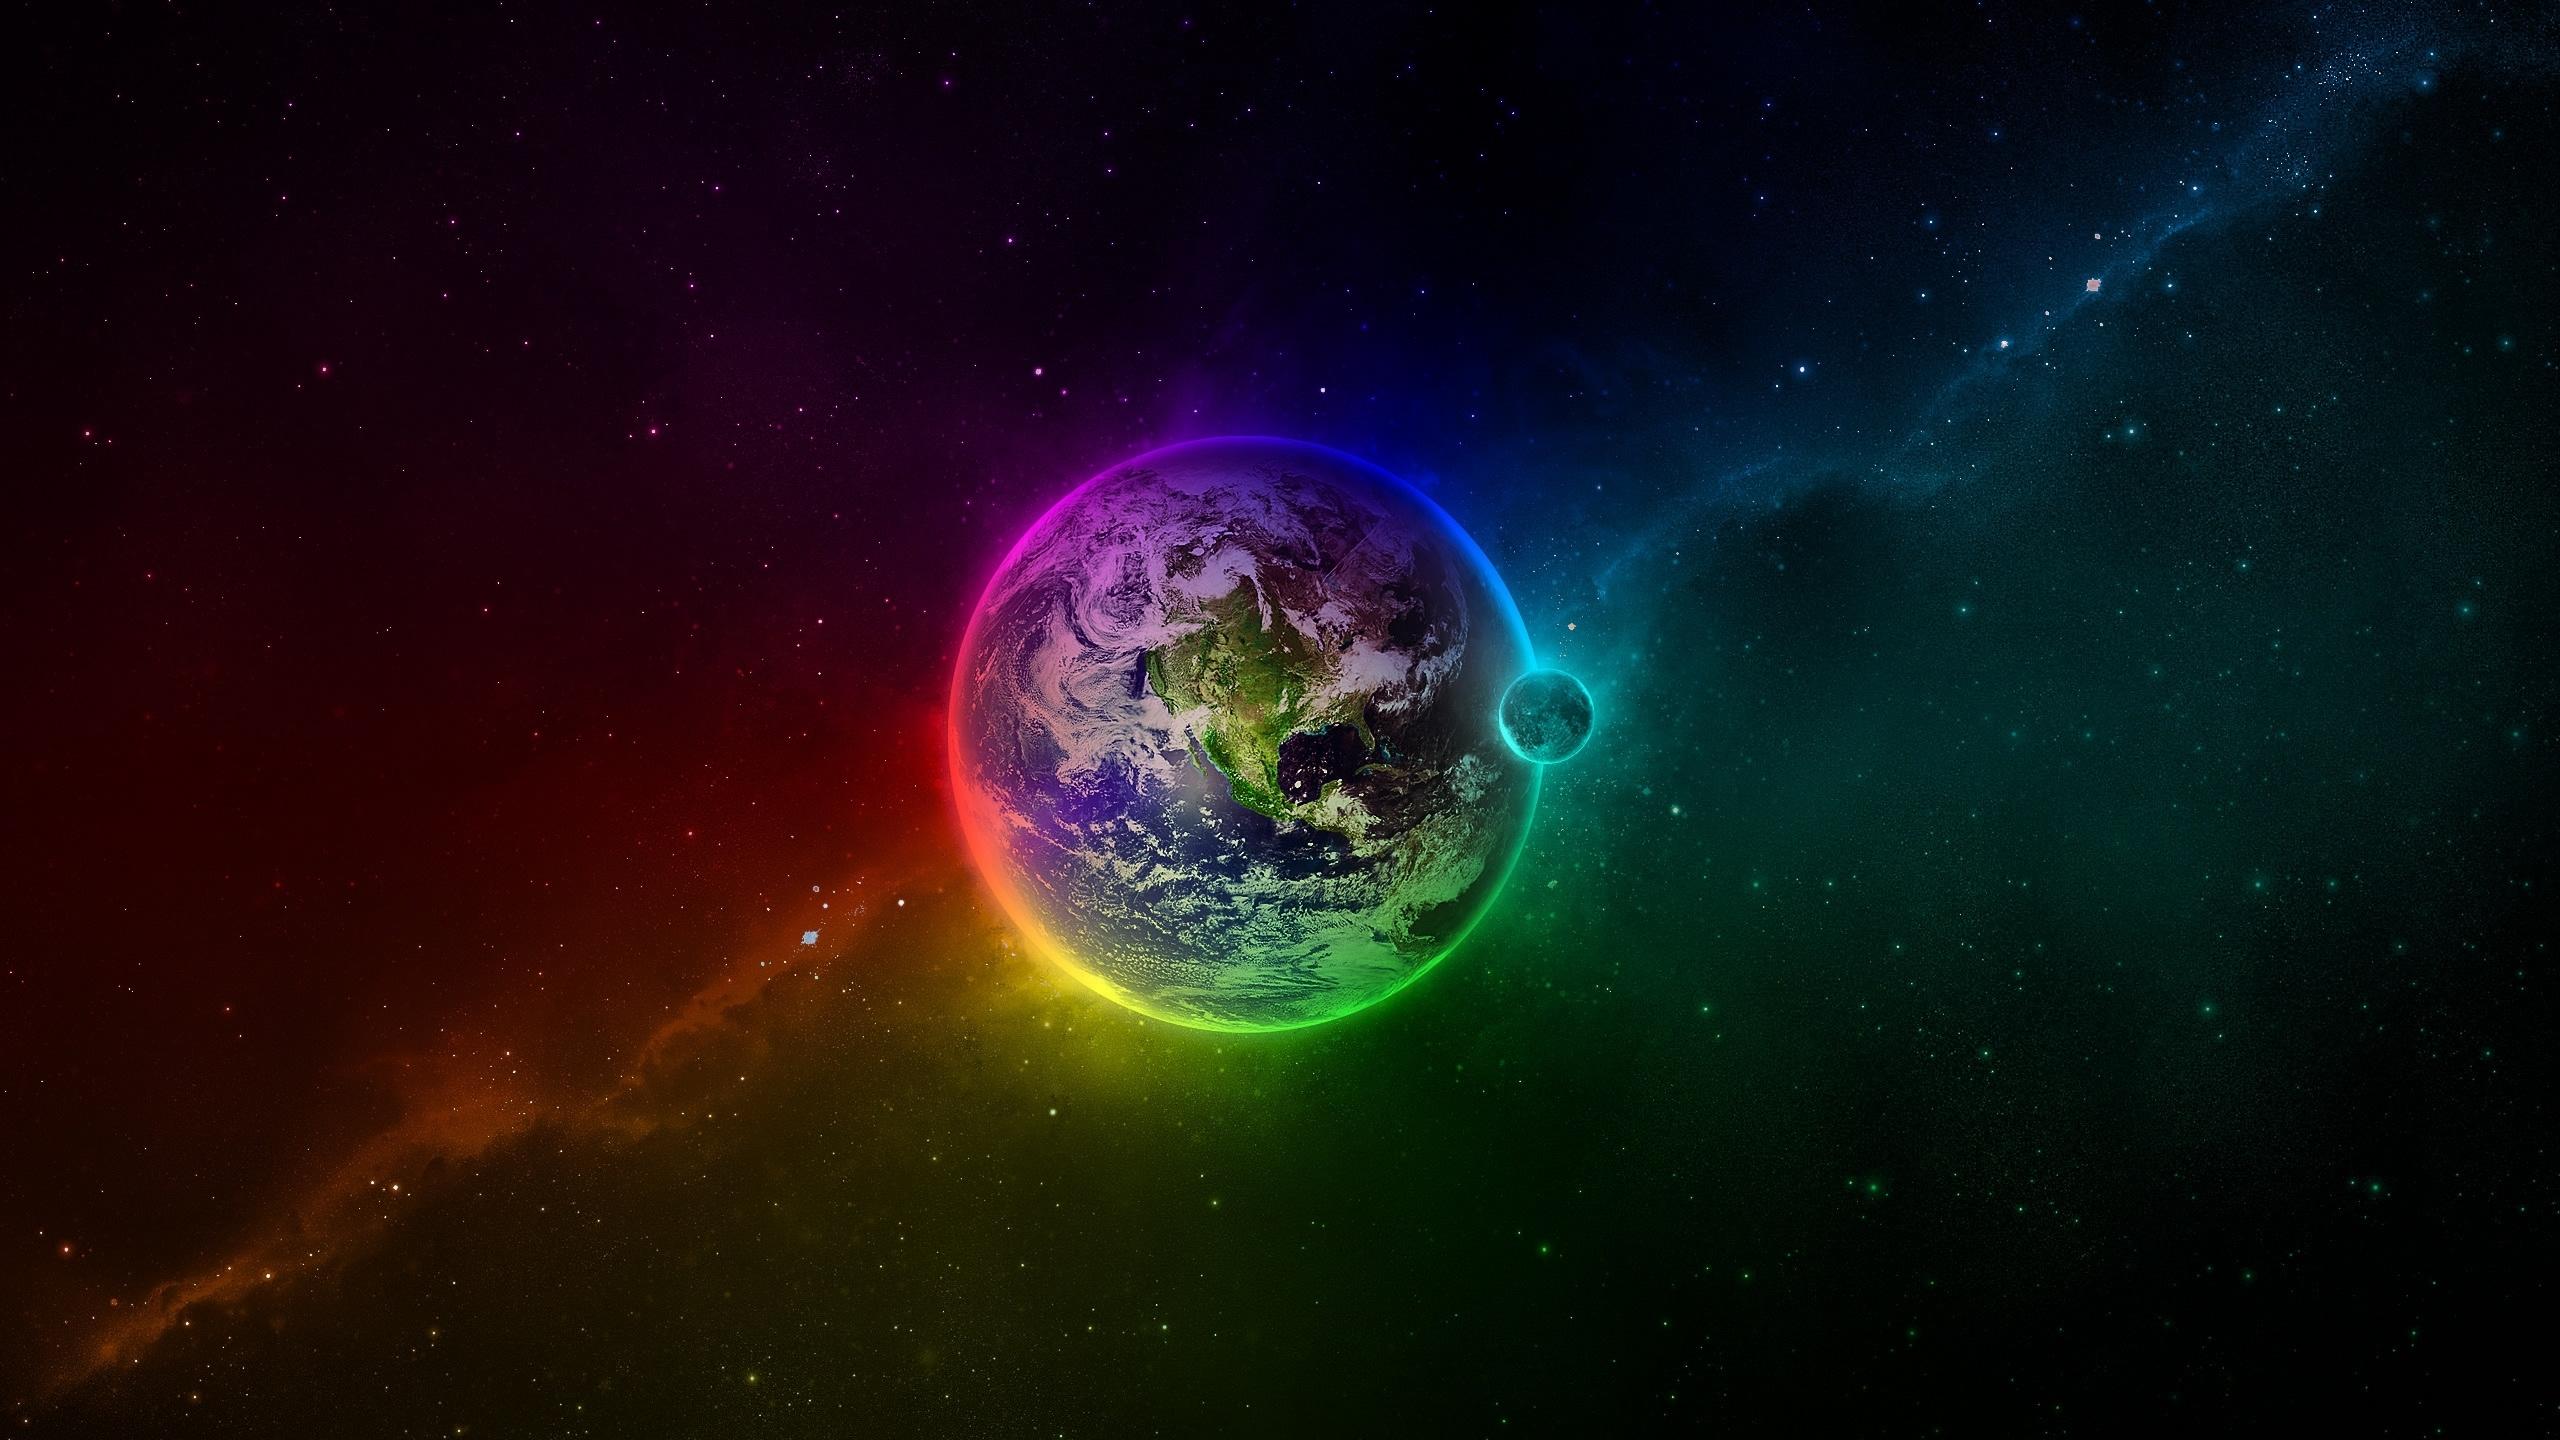 Colorful Earth Mac Wallpaper Download Mac Wallpapers Download 2560x1440